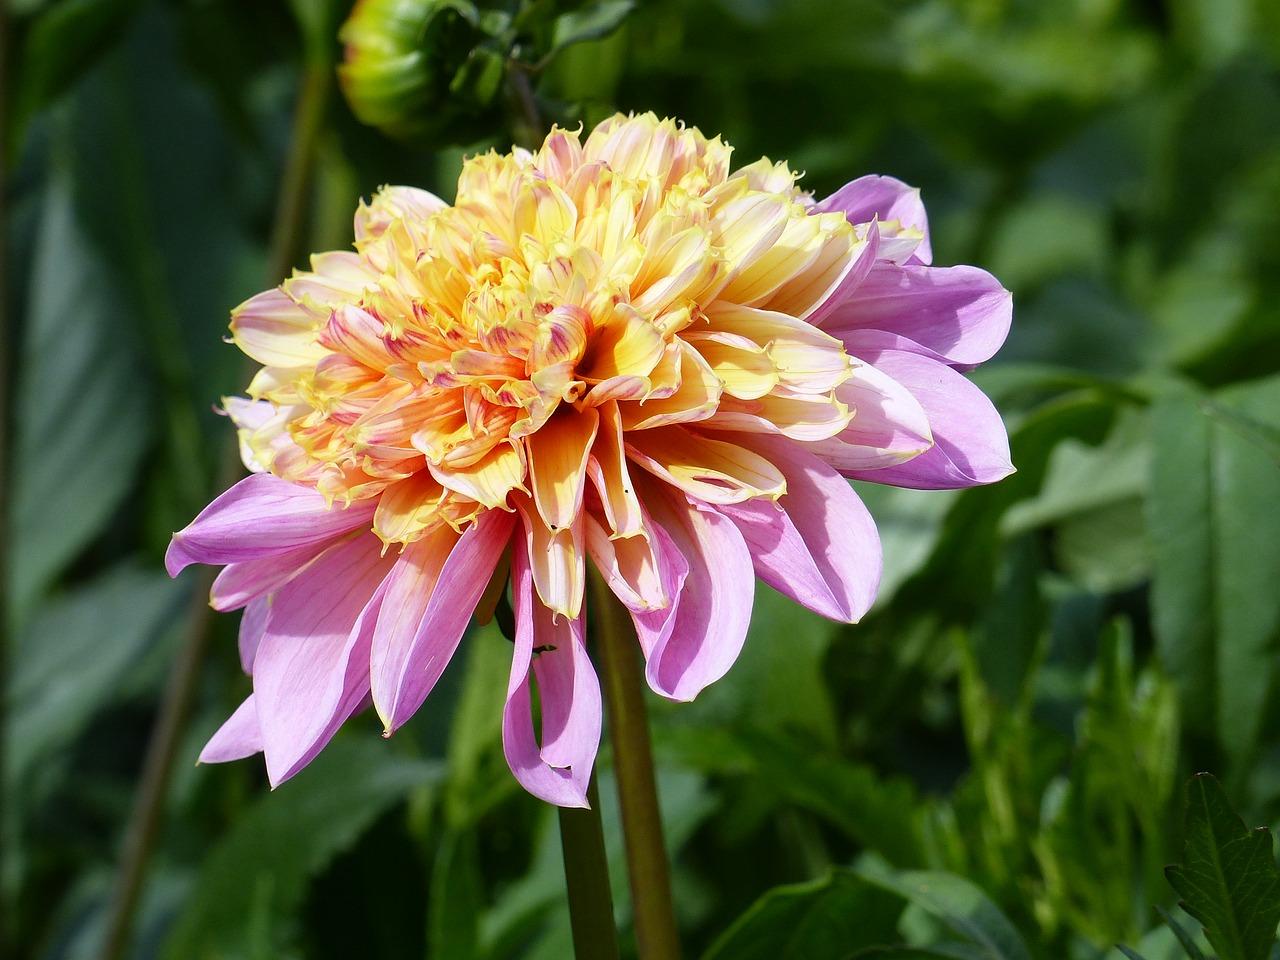 Dahliaflowerplantcolorssummer Free Photo From Needpix